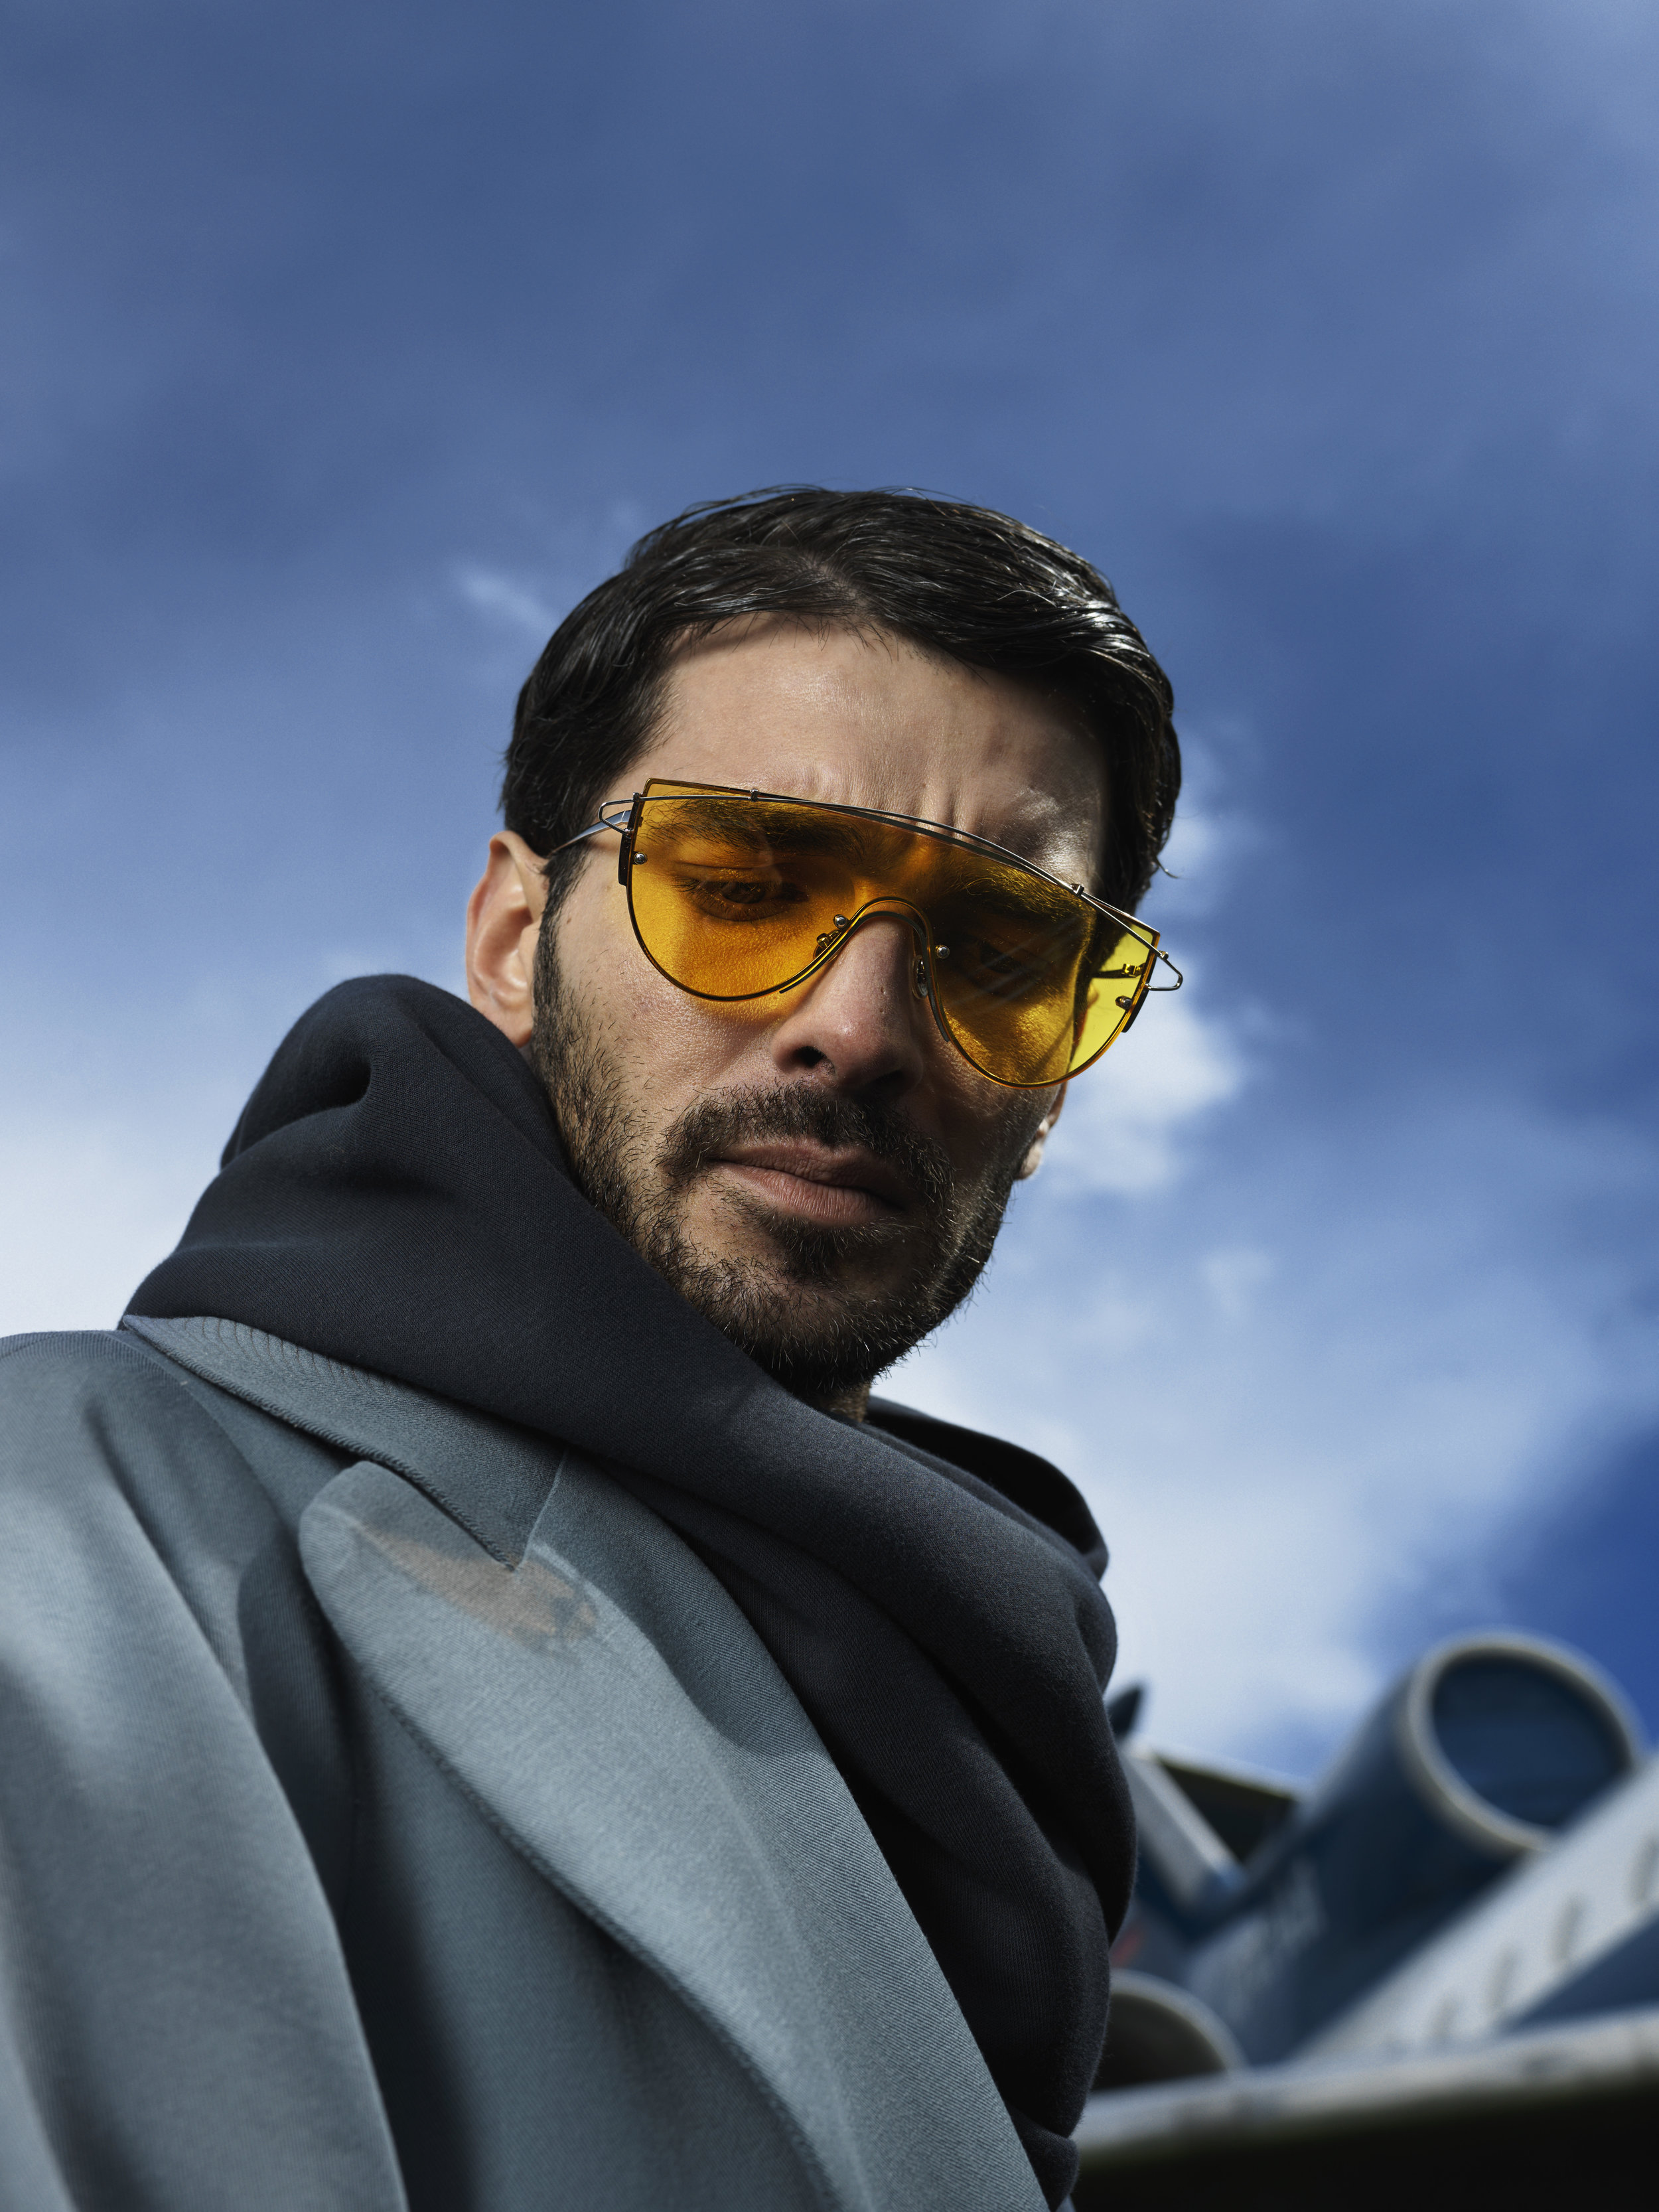 Sweatshirt Anton Lisin Coat Salema Haute Couture Glasses stylist's own